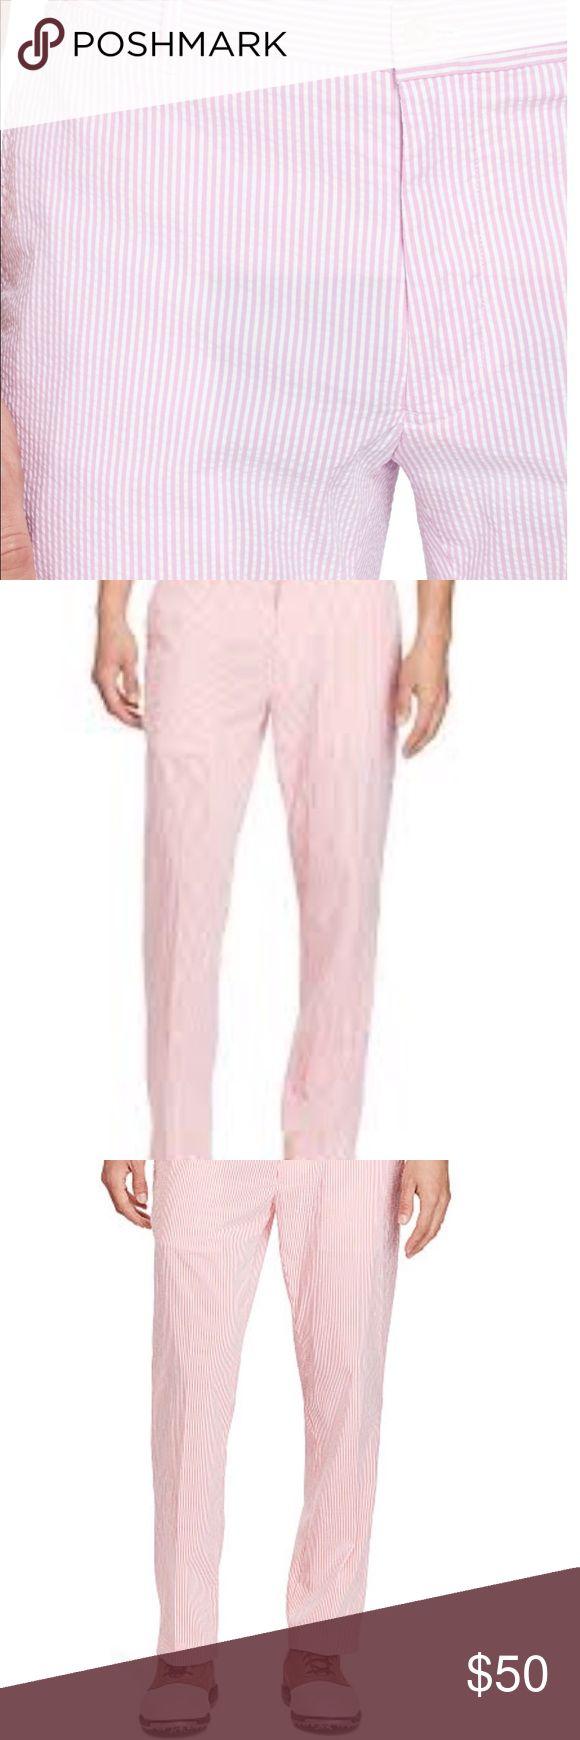 Polo fashion pas cher polo ralph lauren femme france polo de marque - Men S Polo Ralph Lauren Brand New Pink Seersucker Pants By Polo Ralph Lauren Size 36